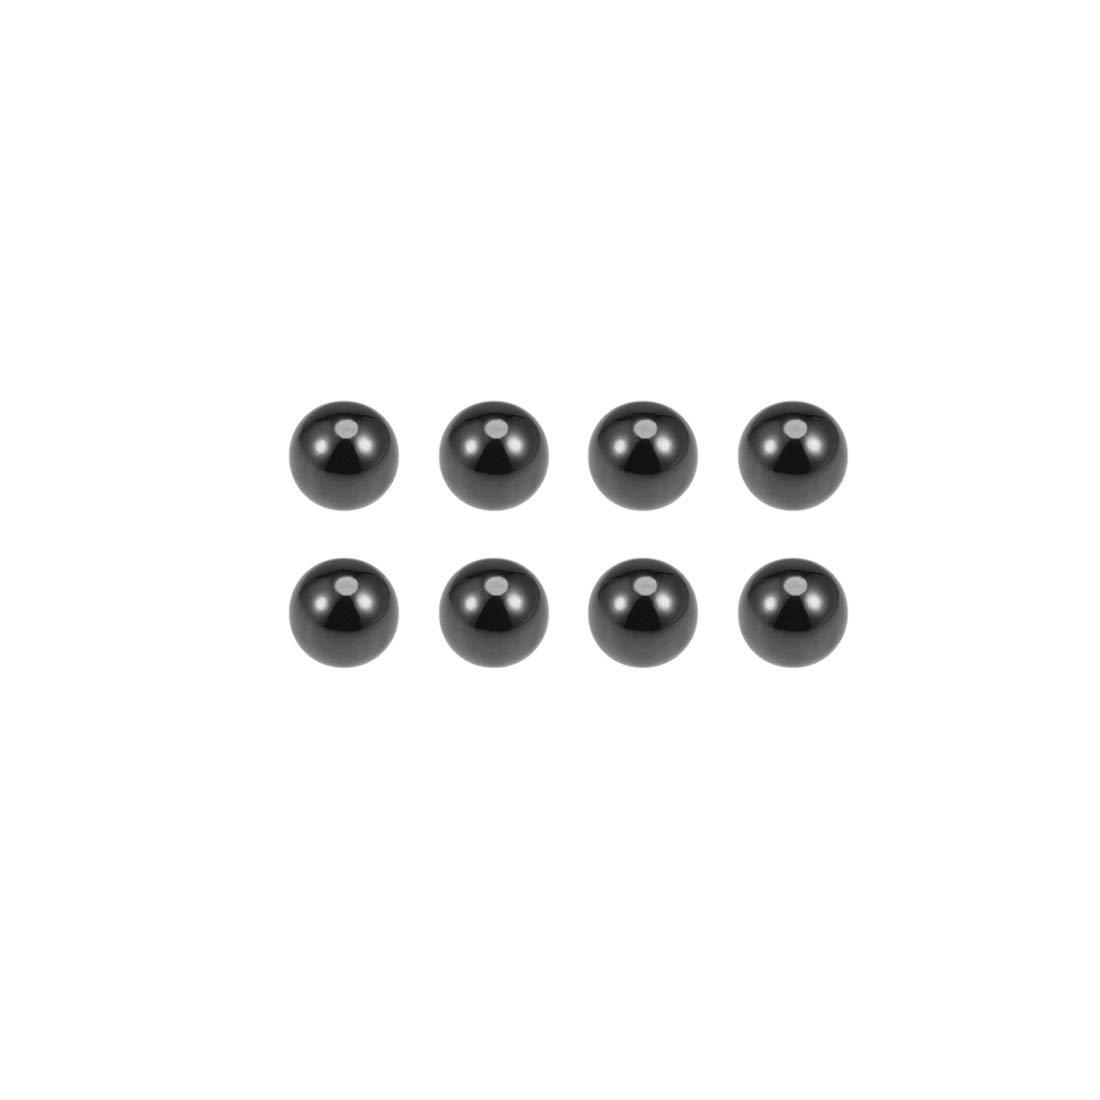 Si3N4 Silicon Nitride Ball G5 Precision 20pcs sourcing map 1//8 Ceramic Bearing Balls